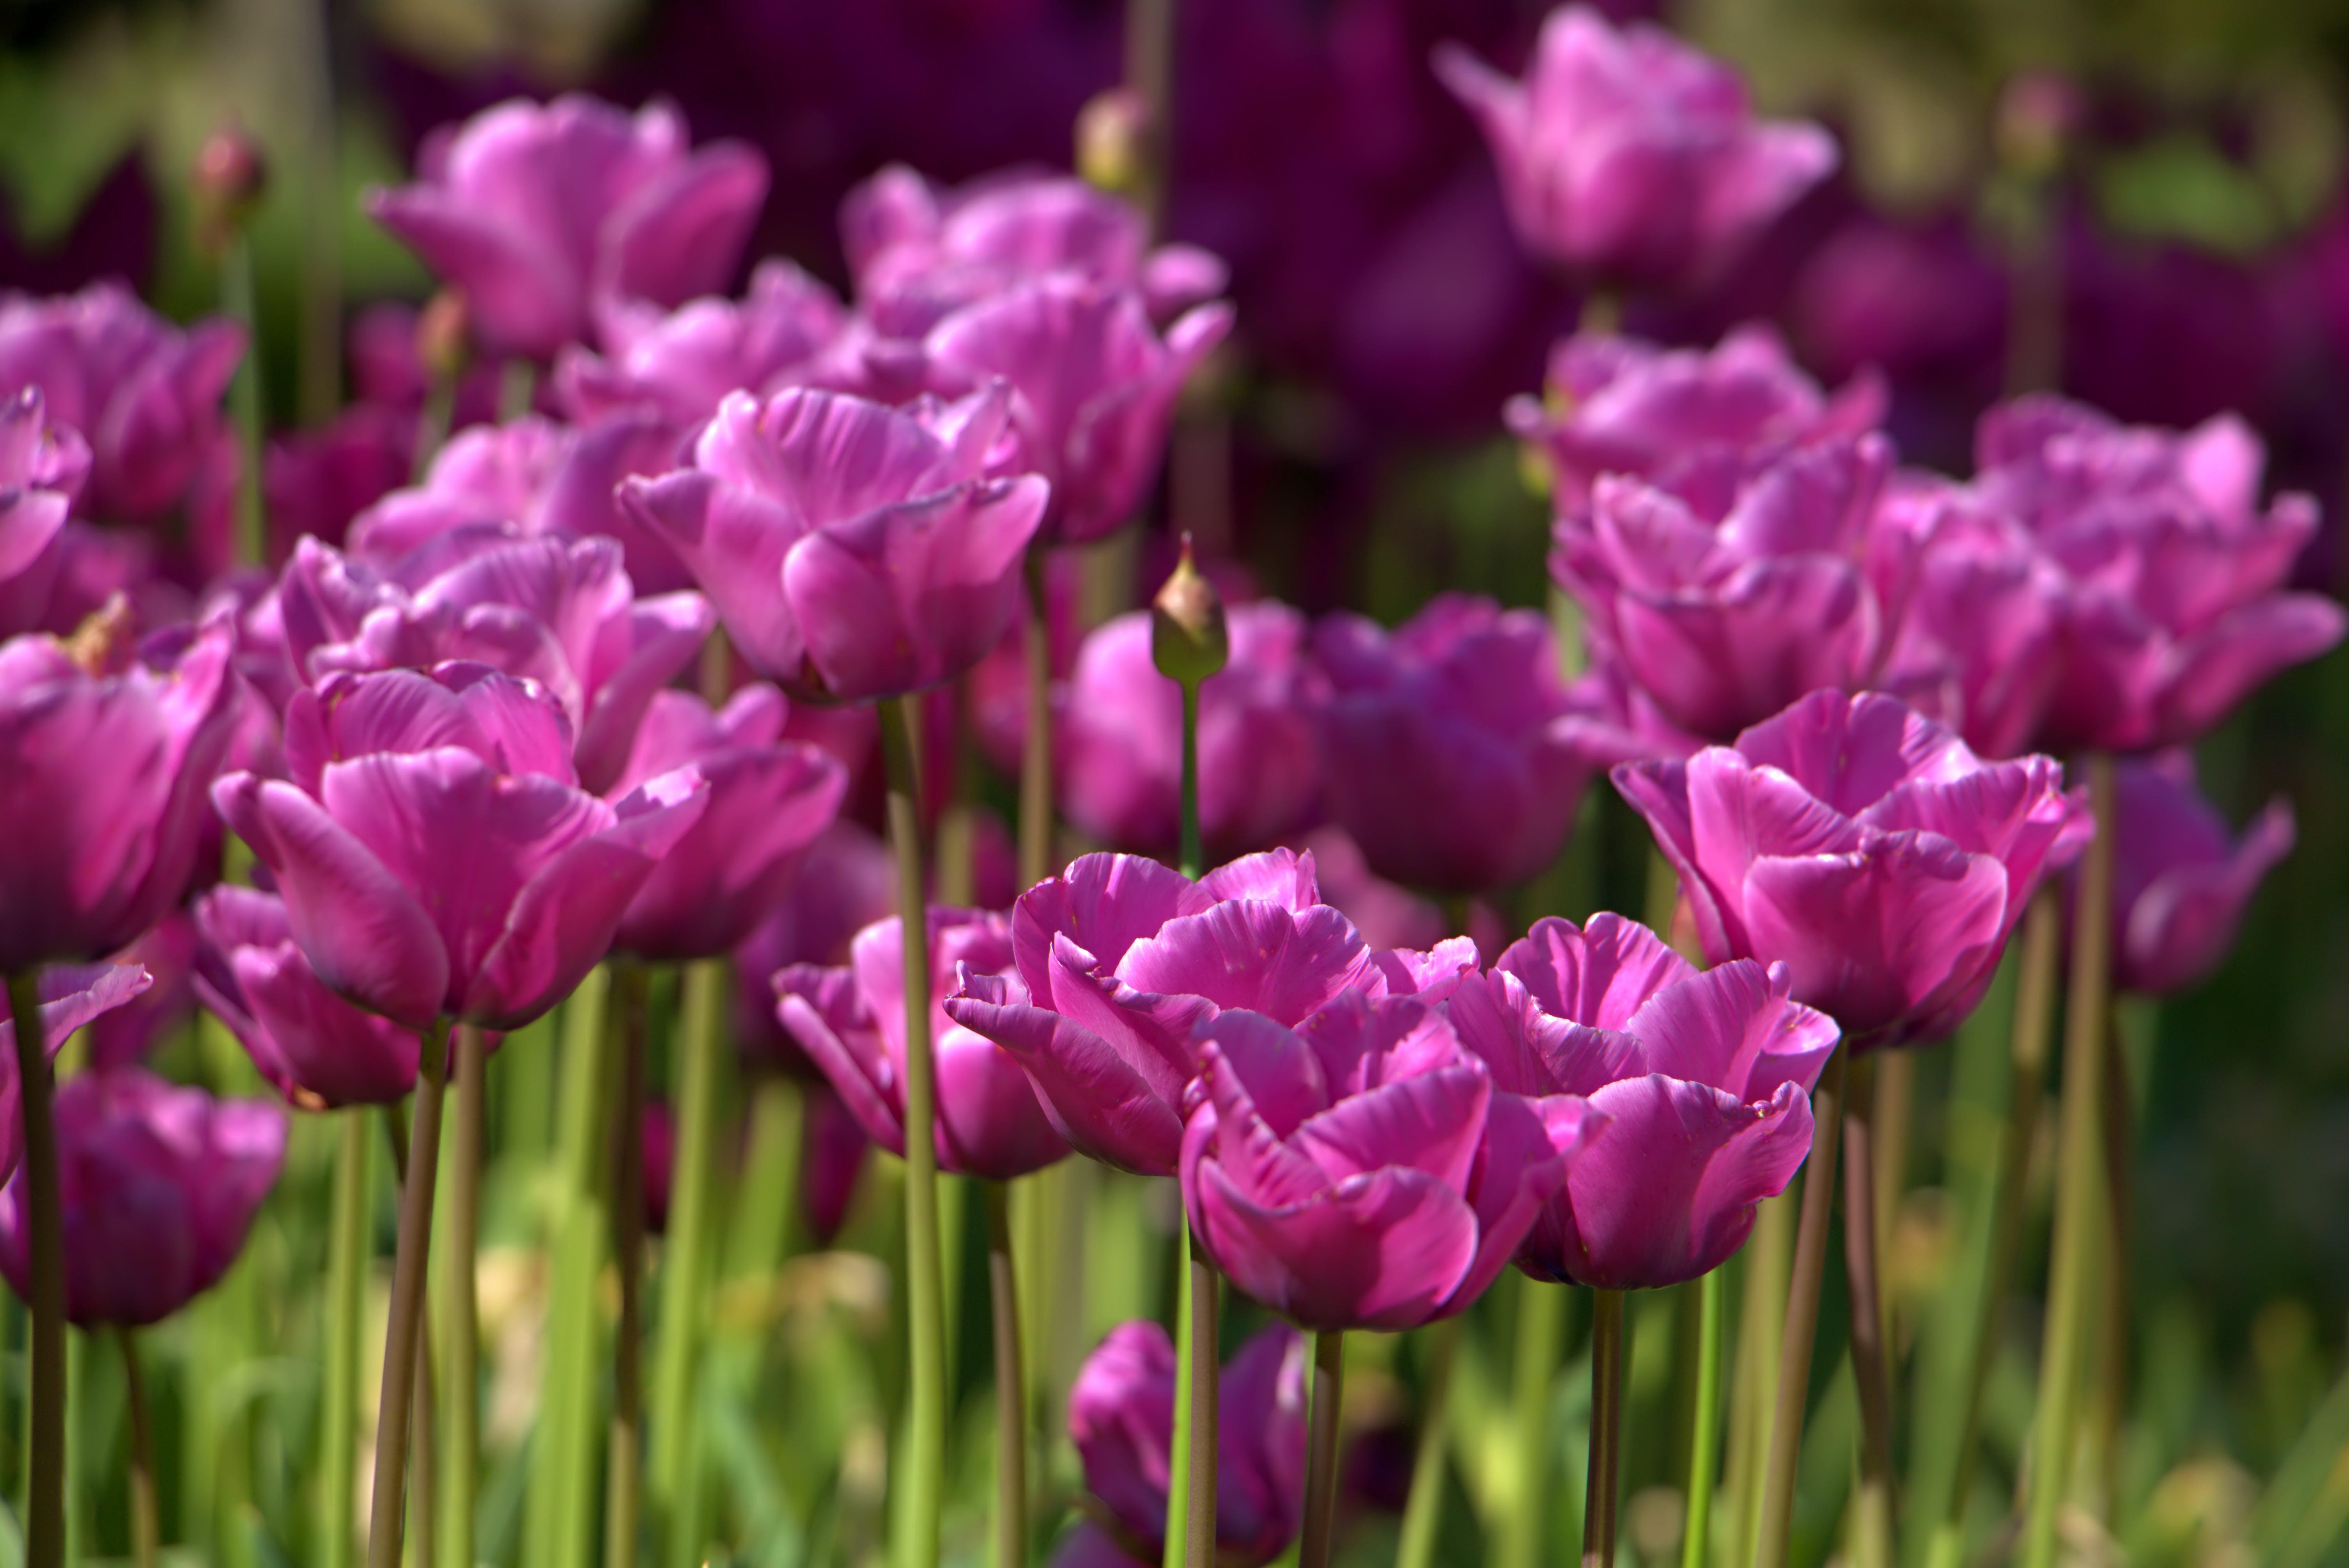 Free stock photo of beautiful flowers, pink flowers, tulips